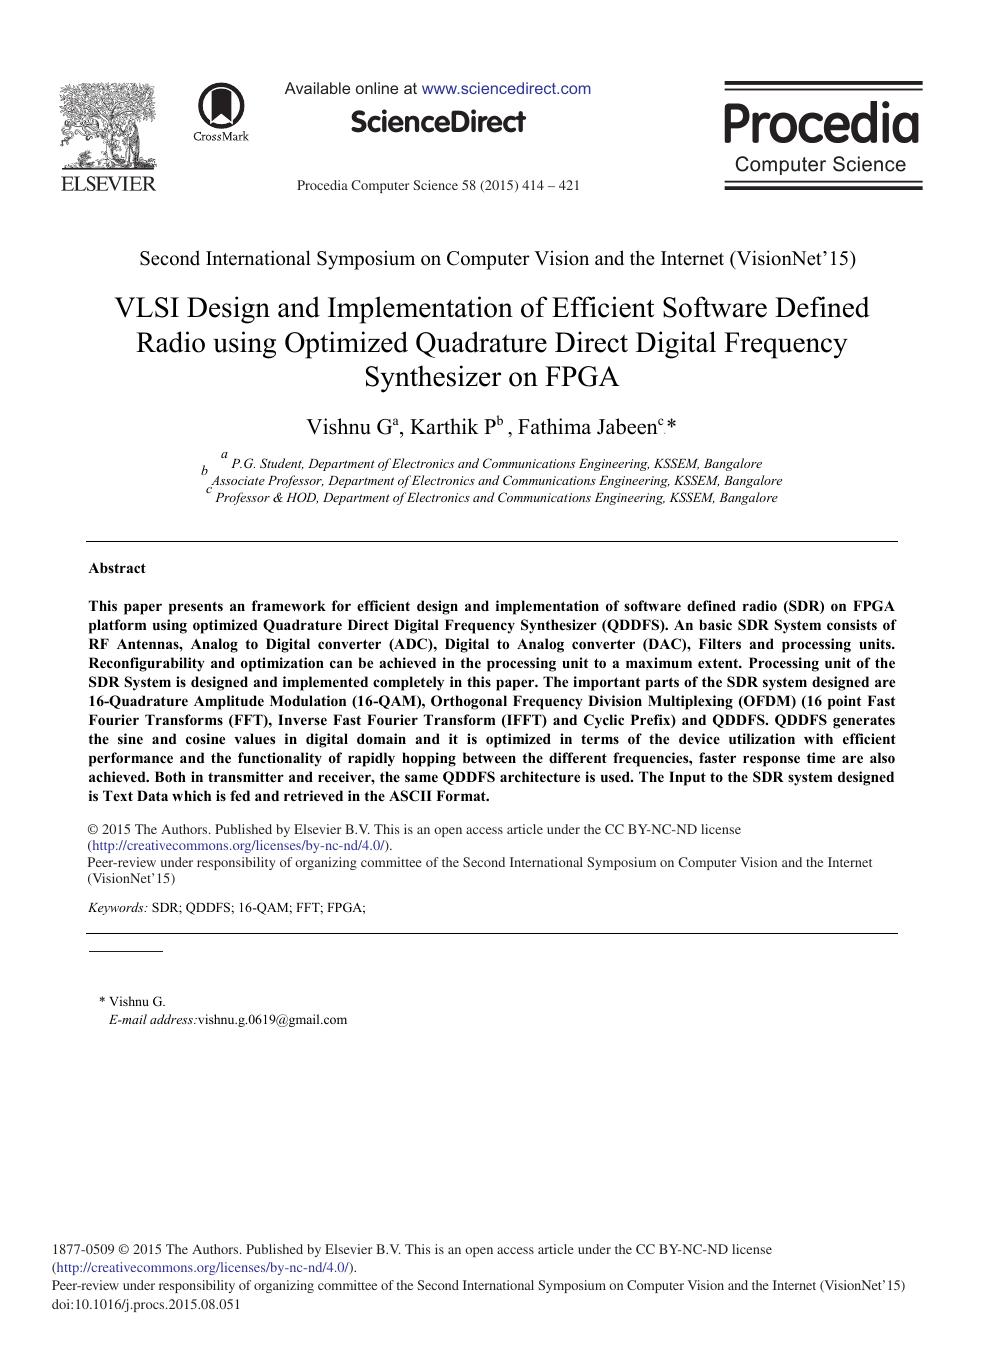 VLSI Design and Implementation of Efficient Software Defined Radio